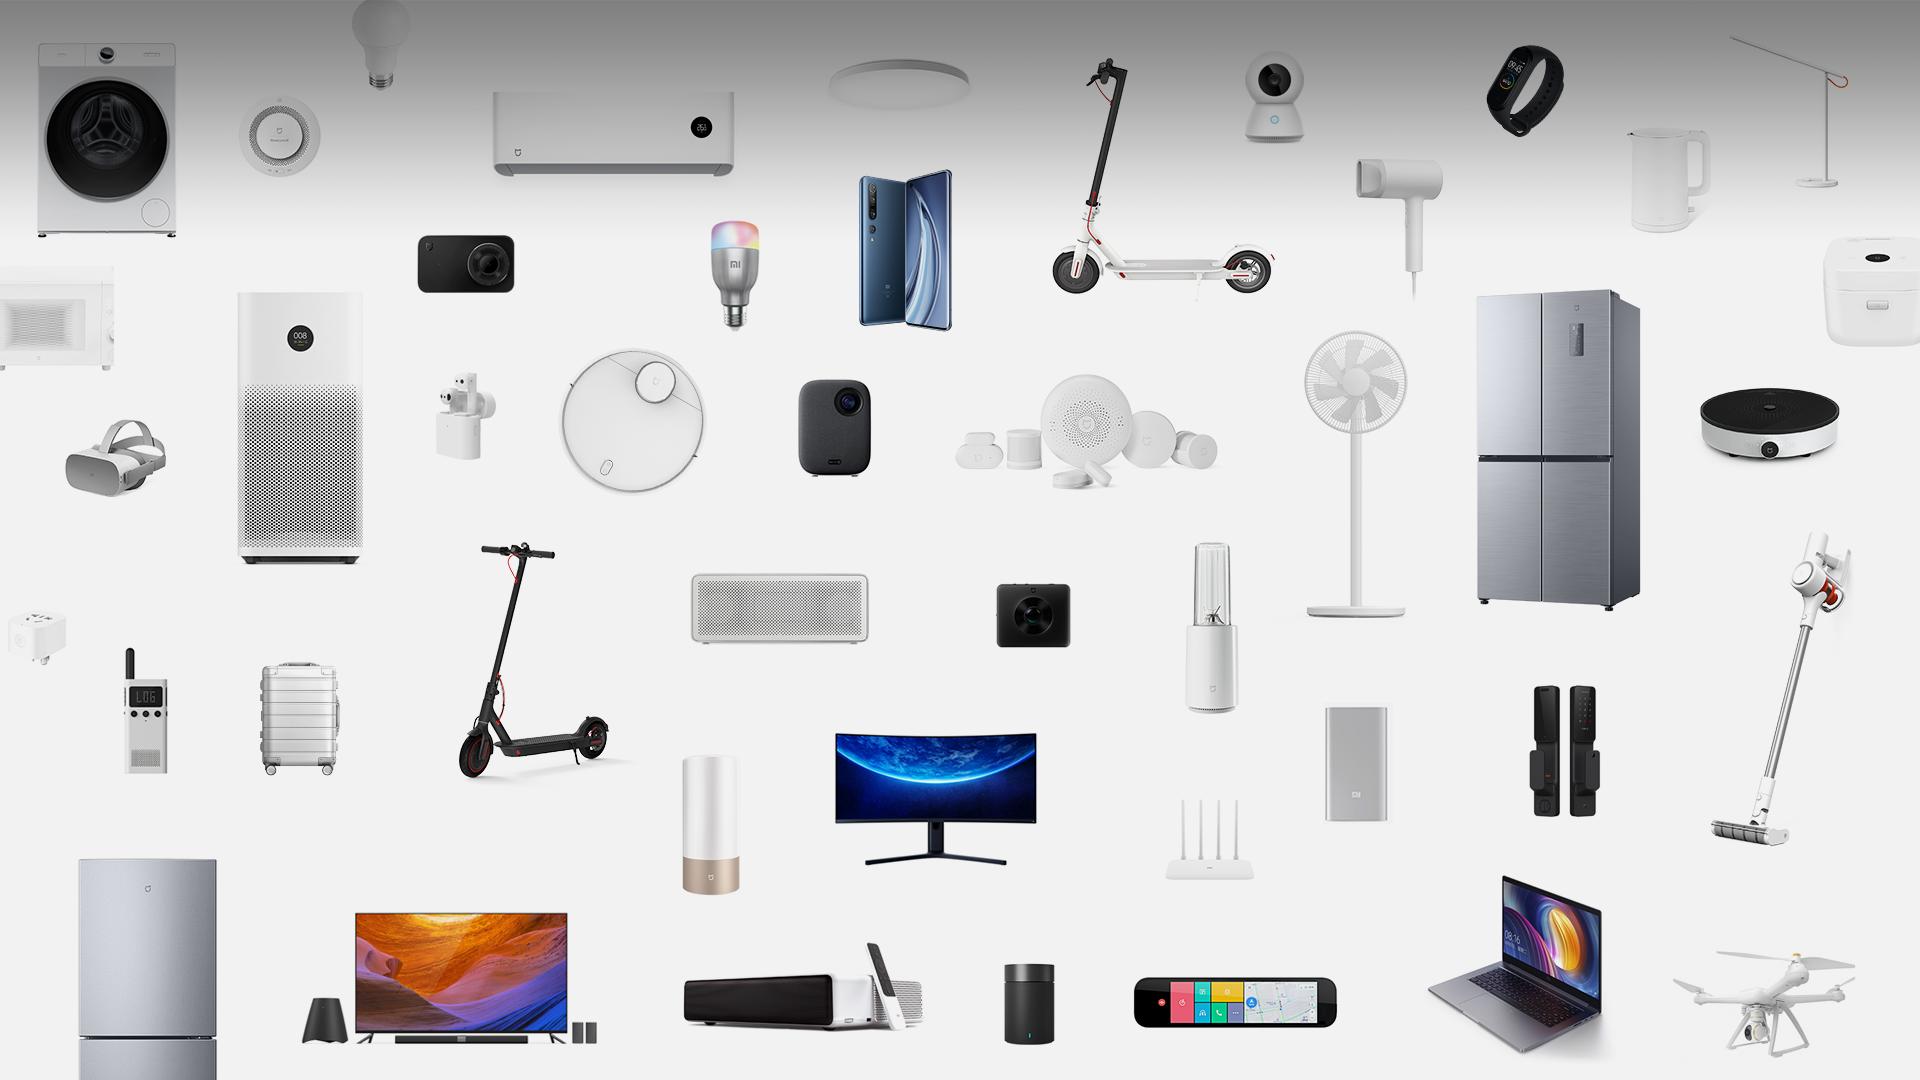 Xiaomi ecosystem